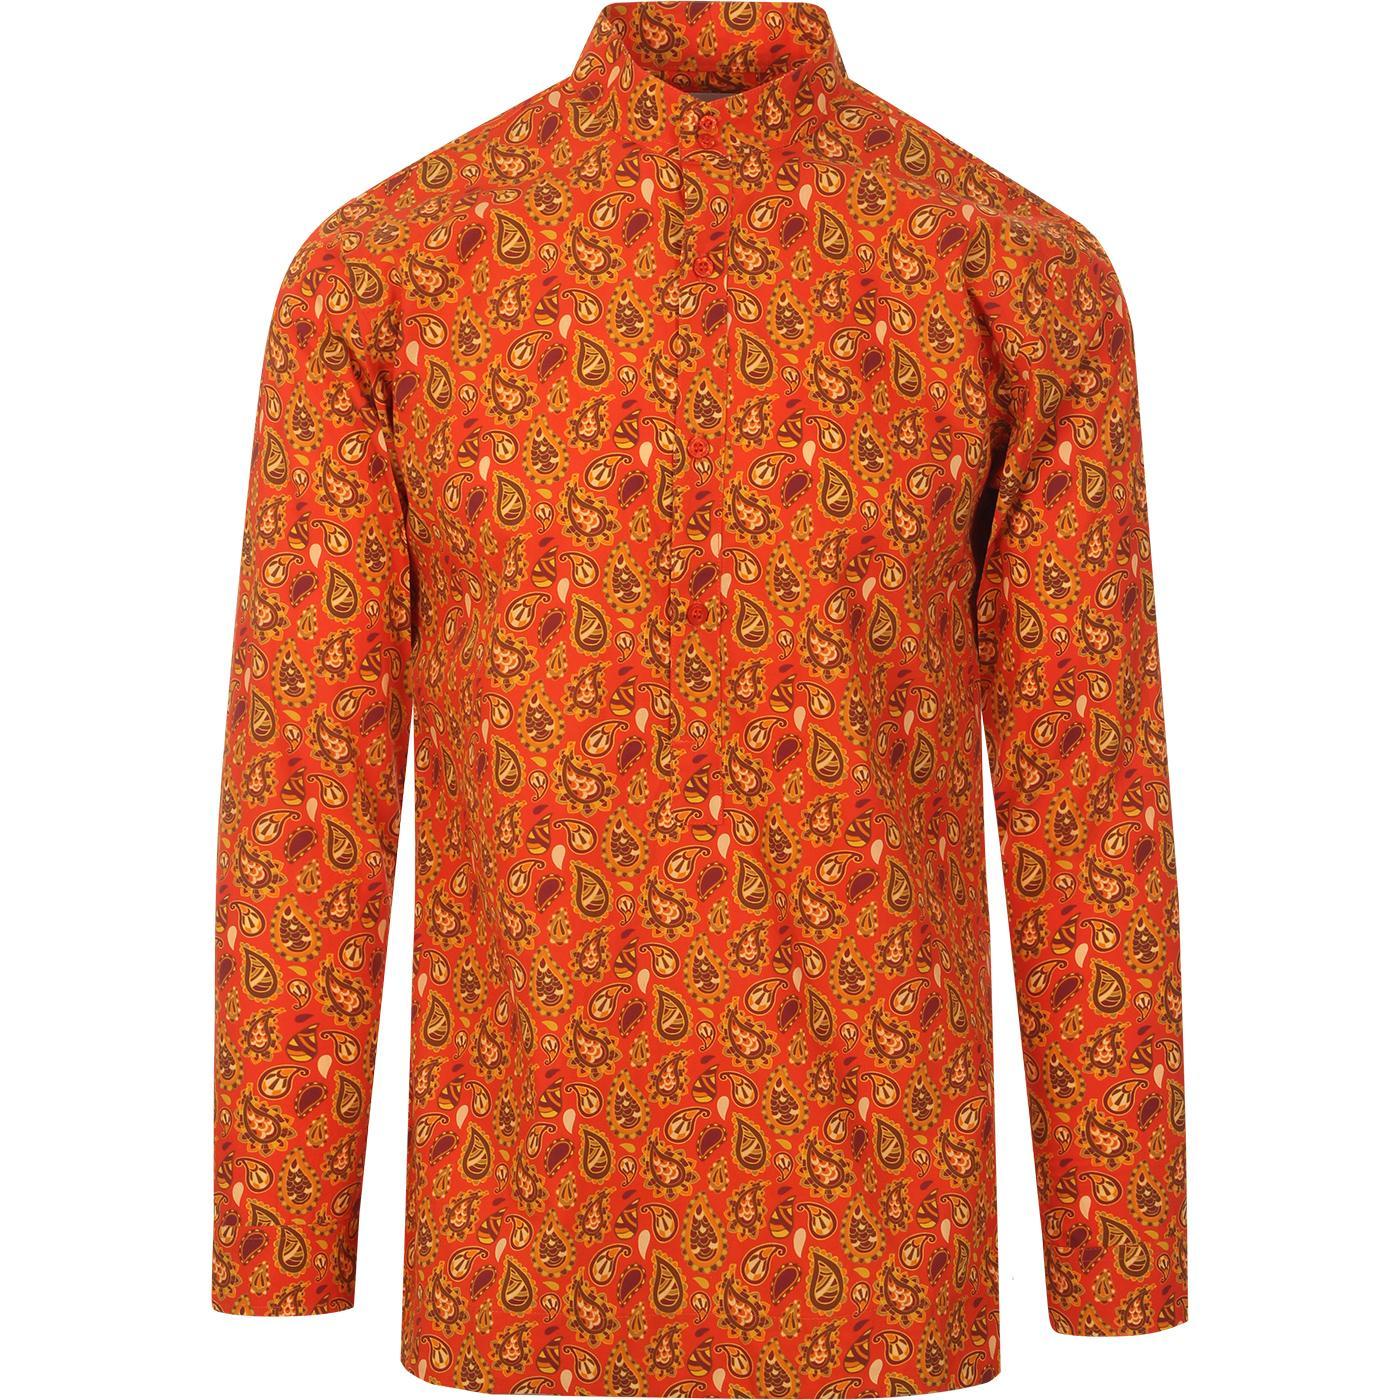 madcap englanad mens gold paisley print kaftan long sleeve shirt orange